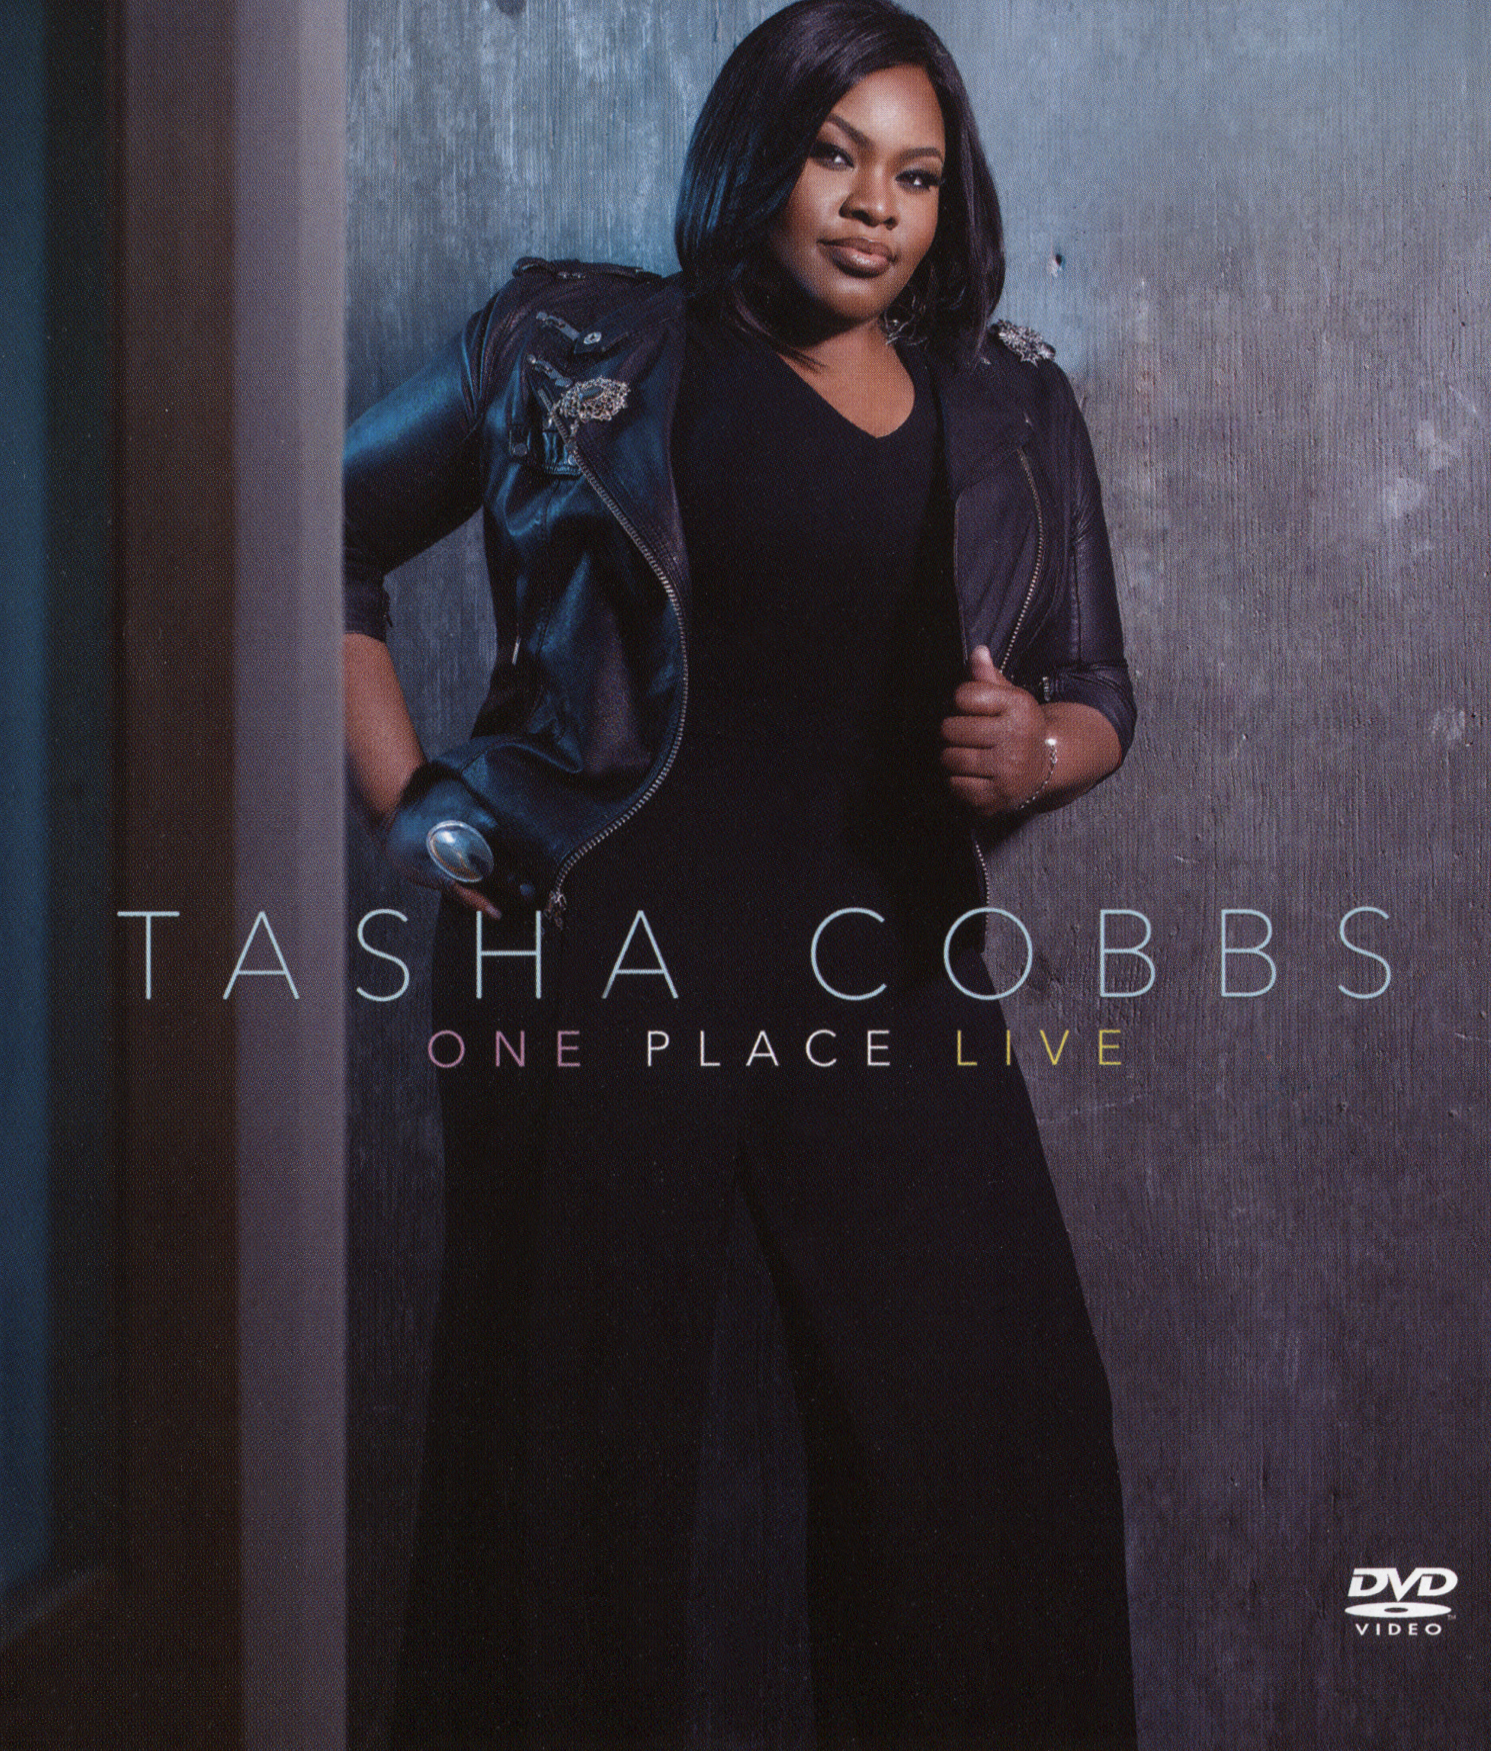 Tasha Cobbs: One Place - Live